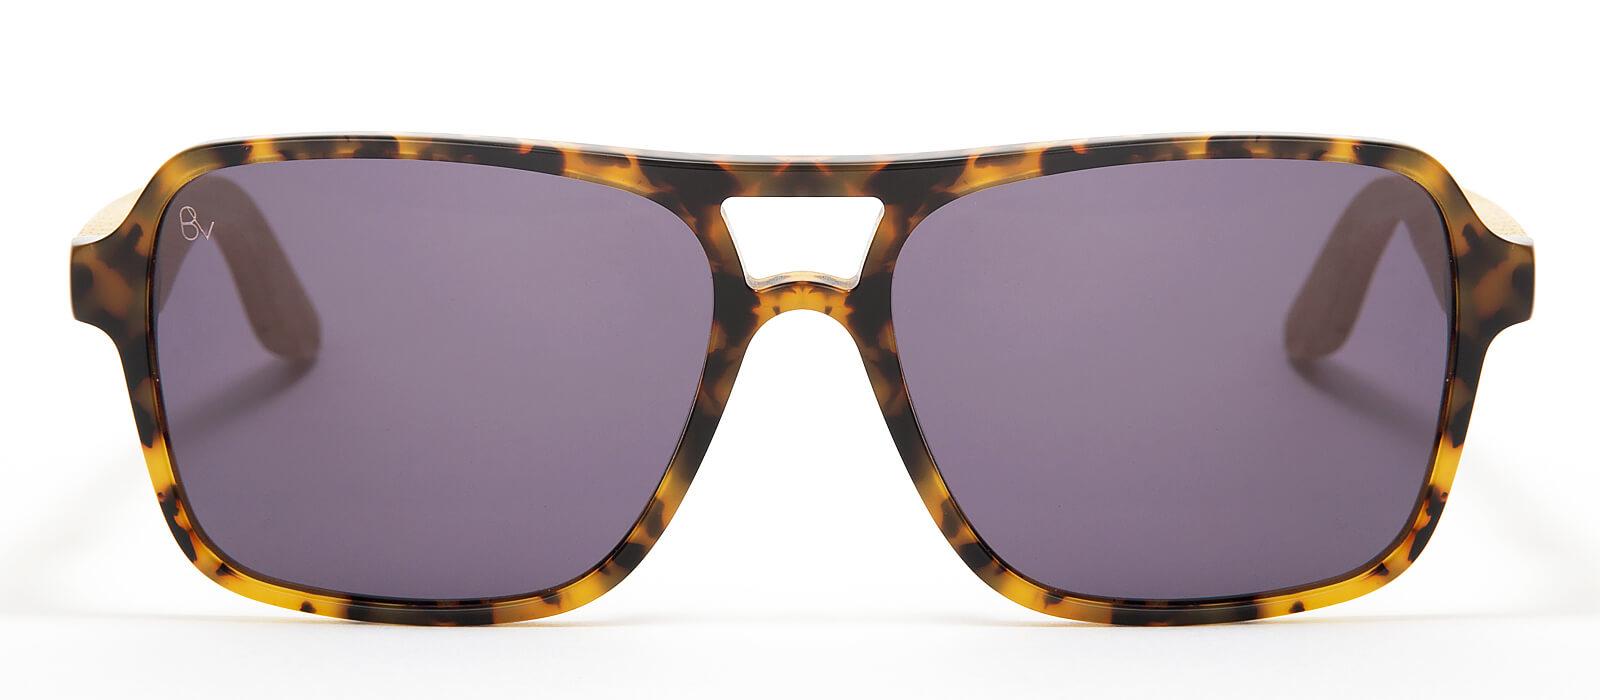 Gafas de sol GIRTAB HABANA